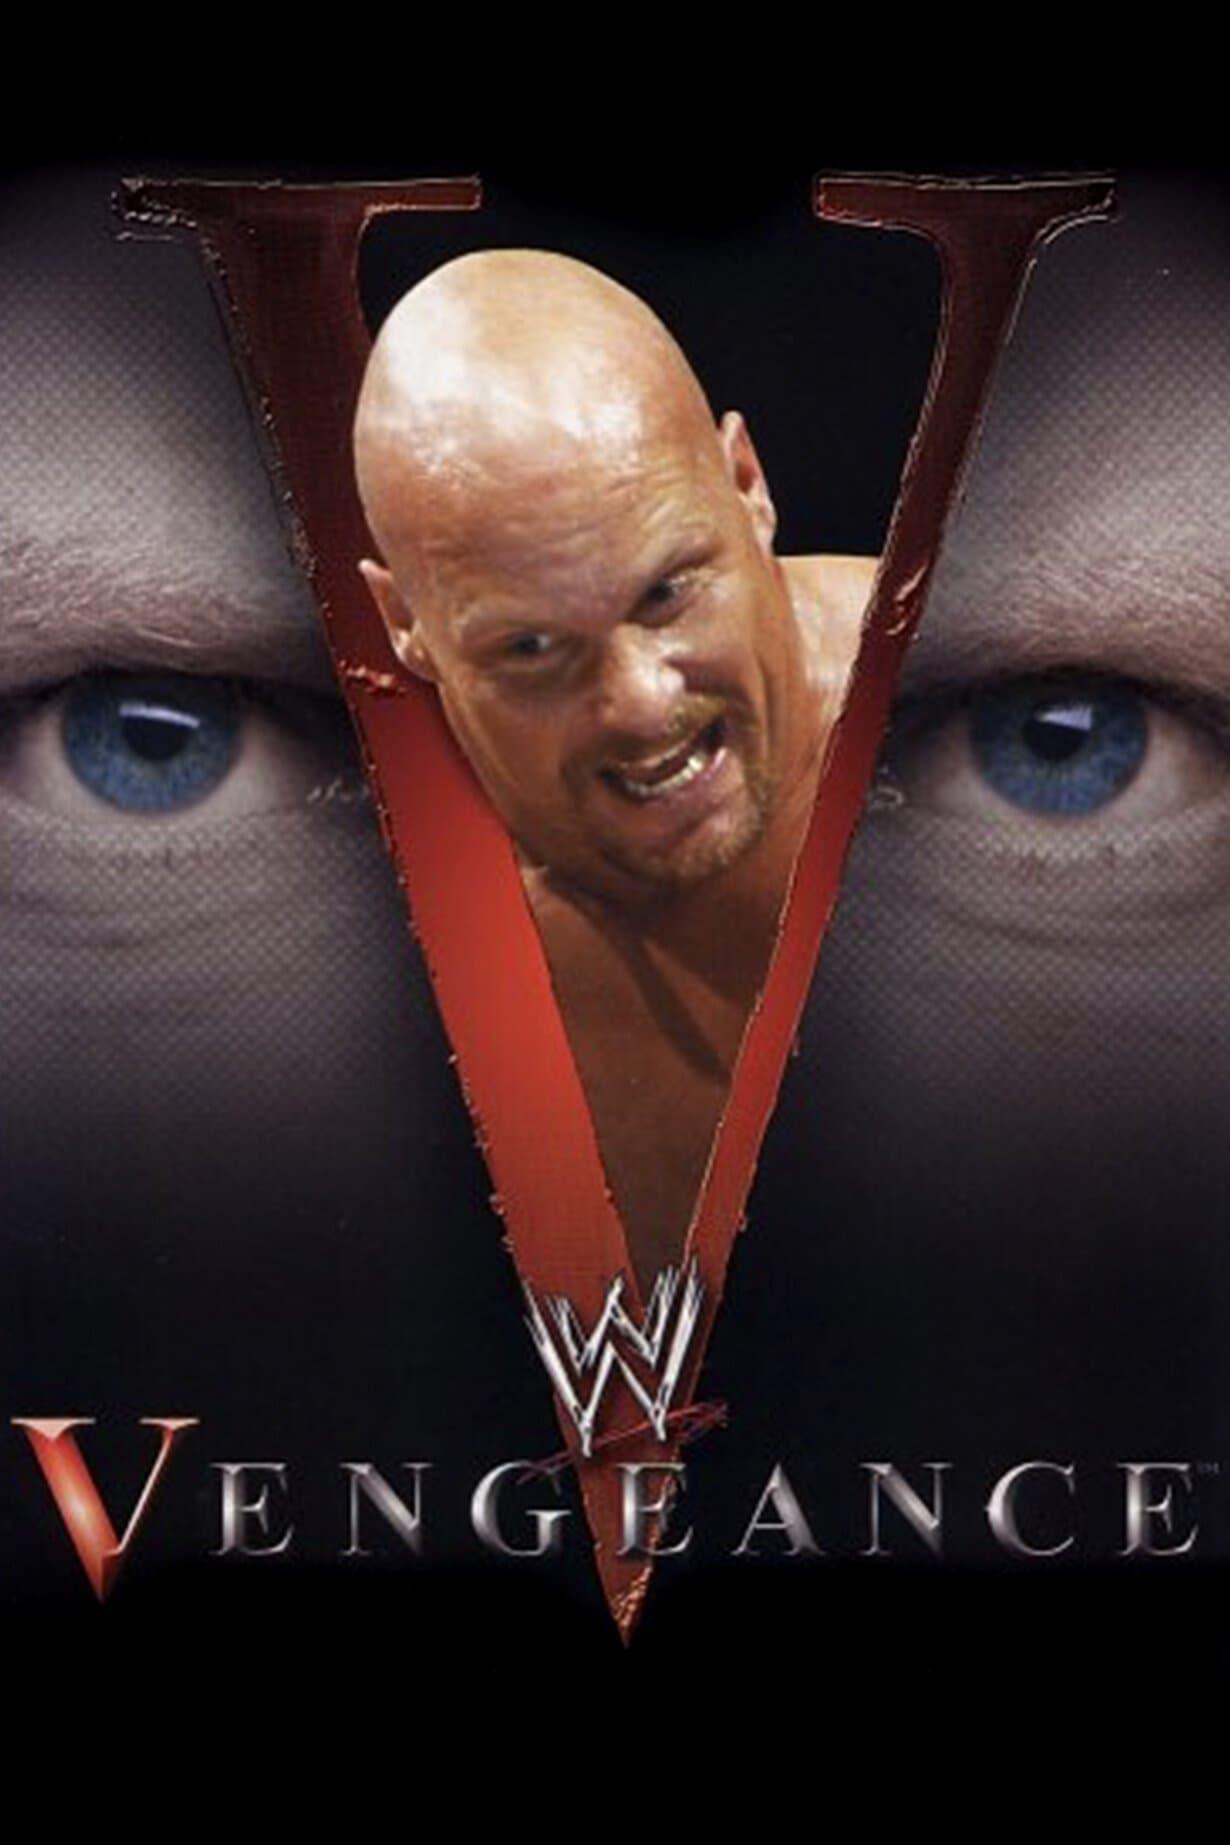 WWE Vengeance 2002